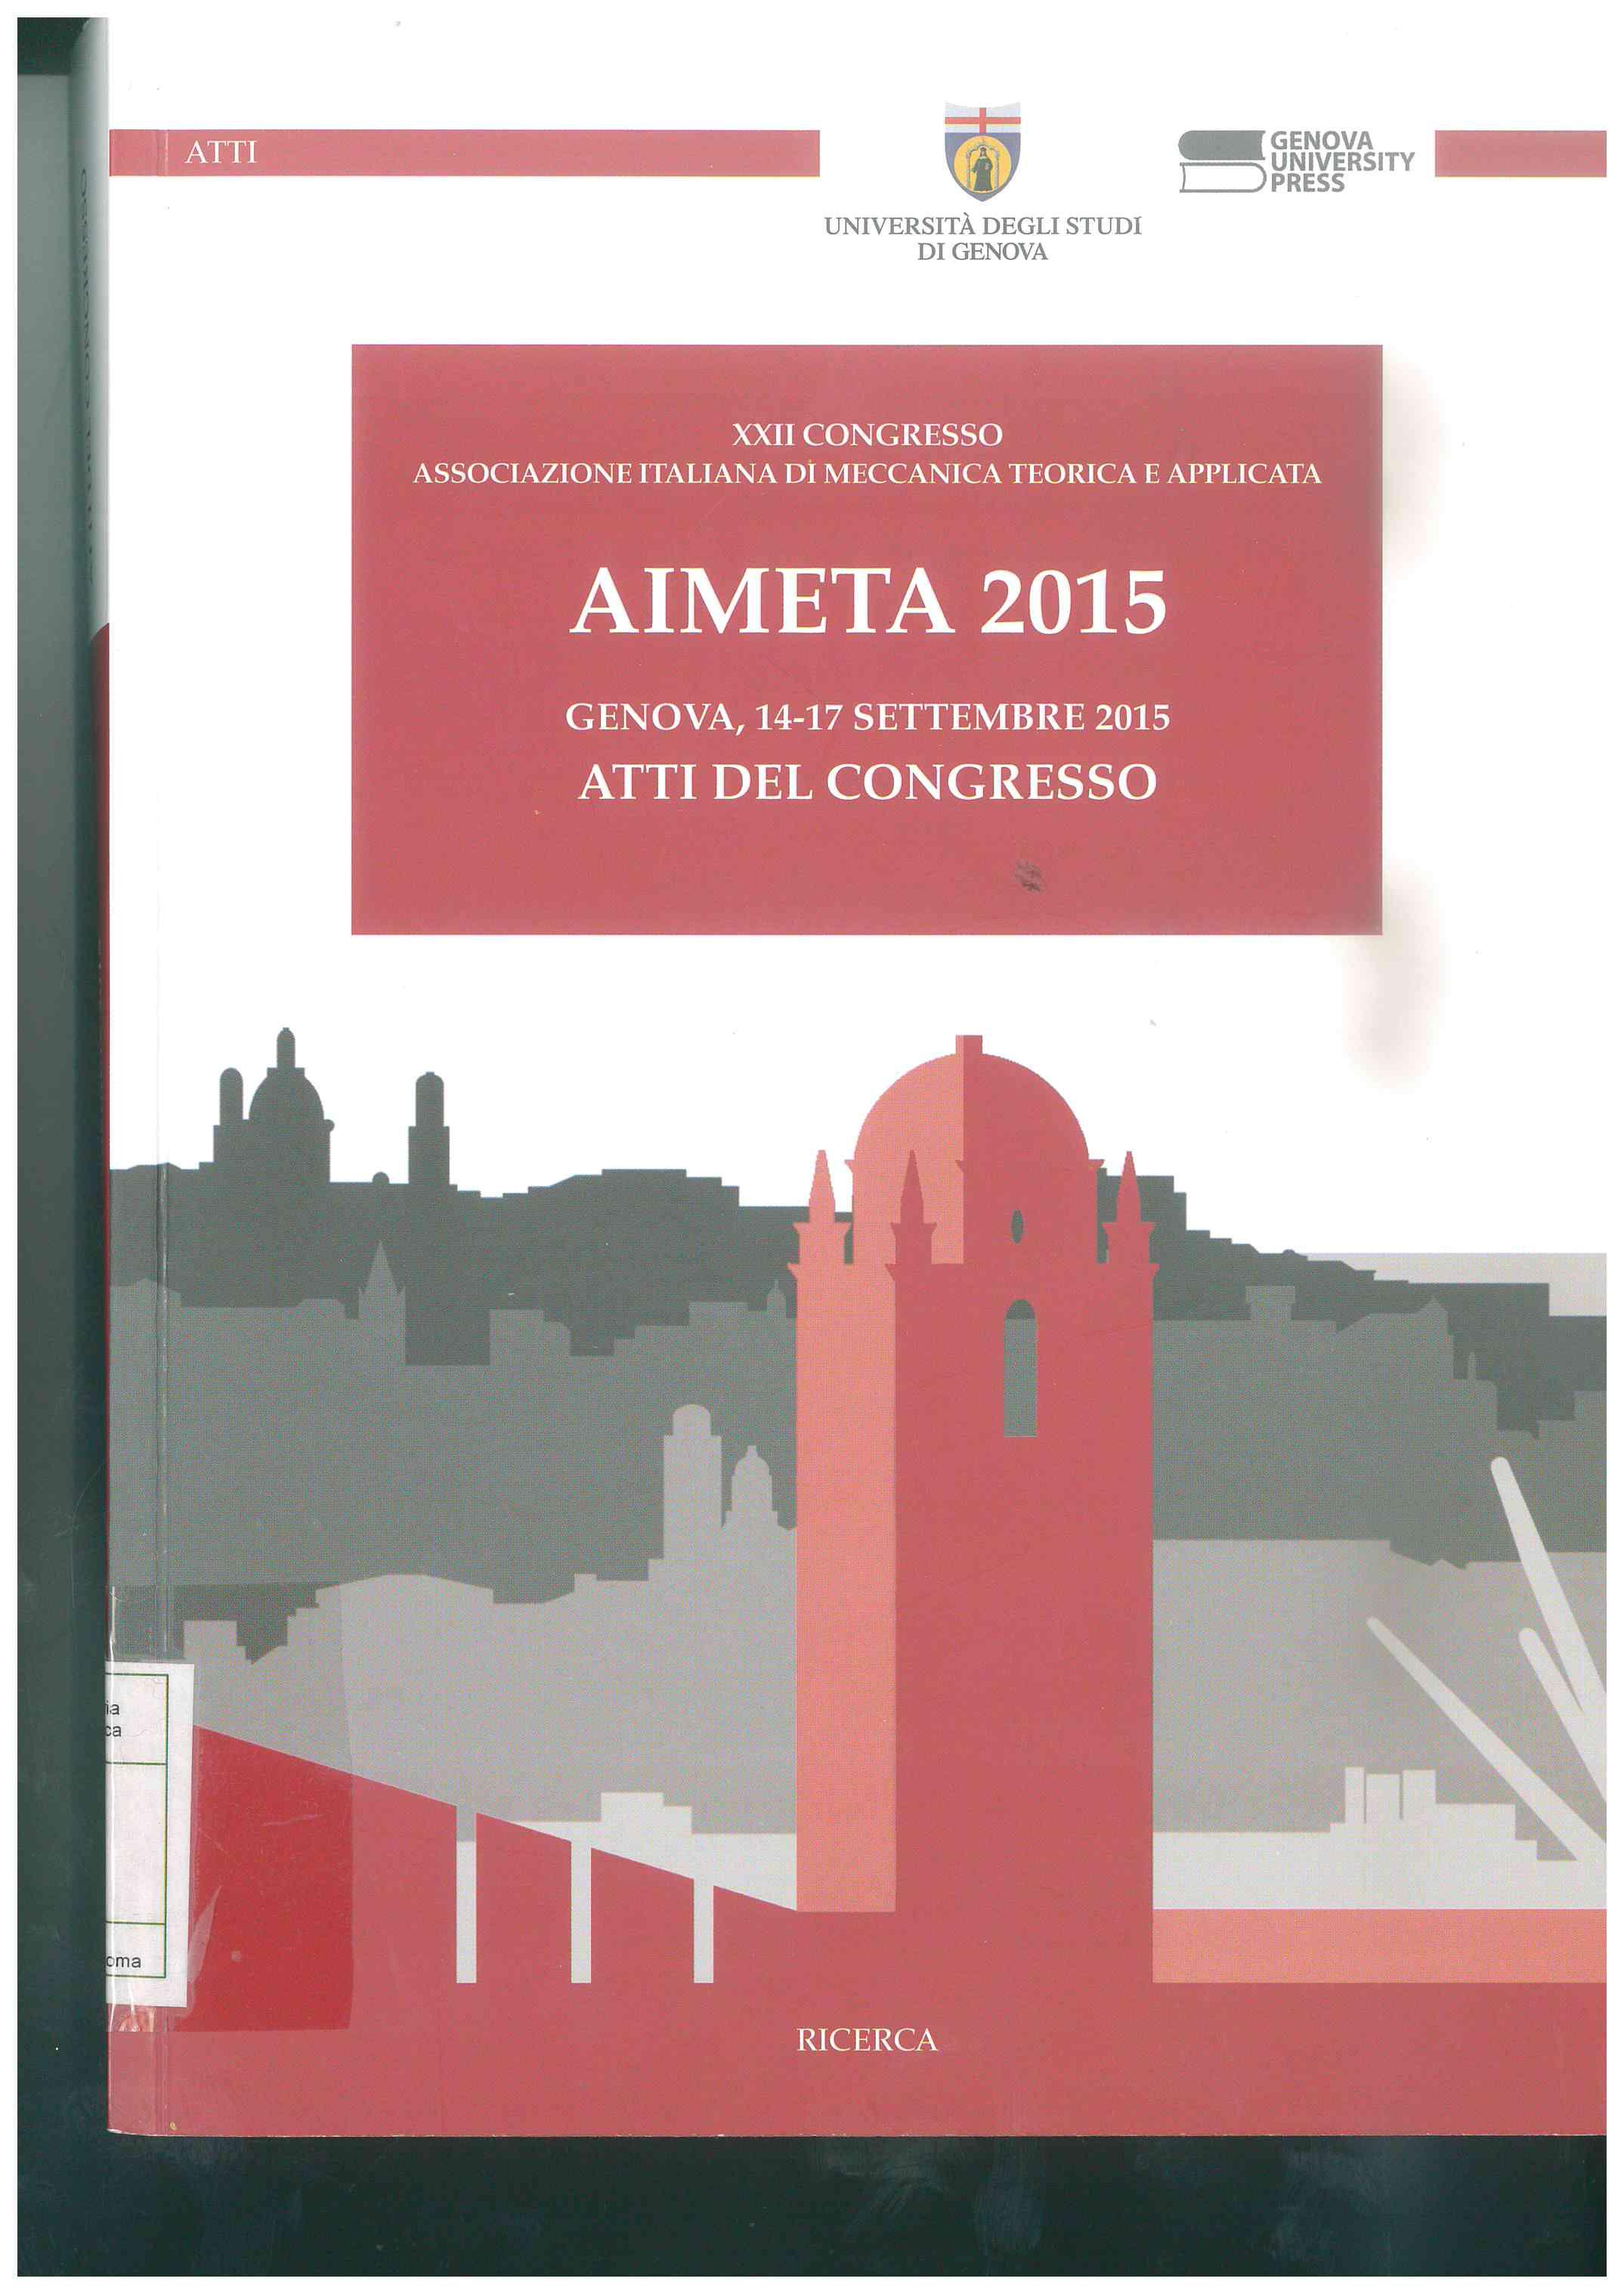 AIMETA 2015